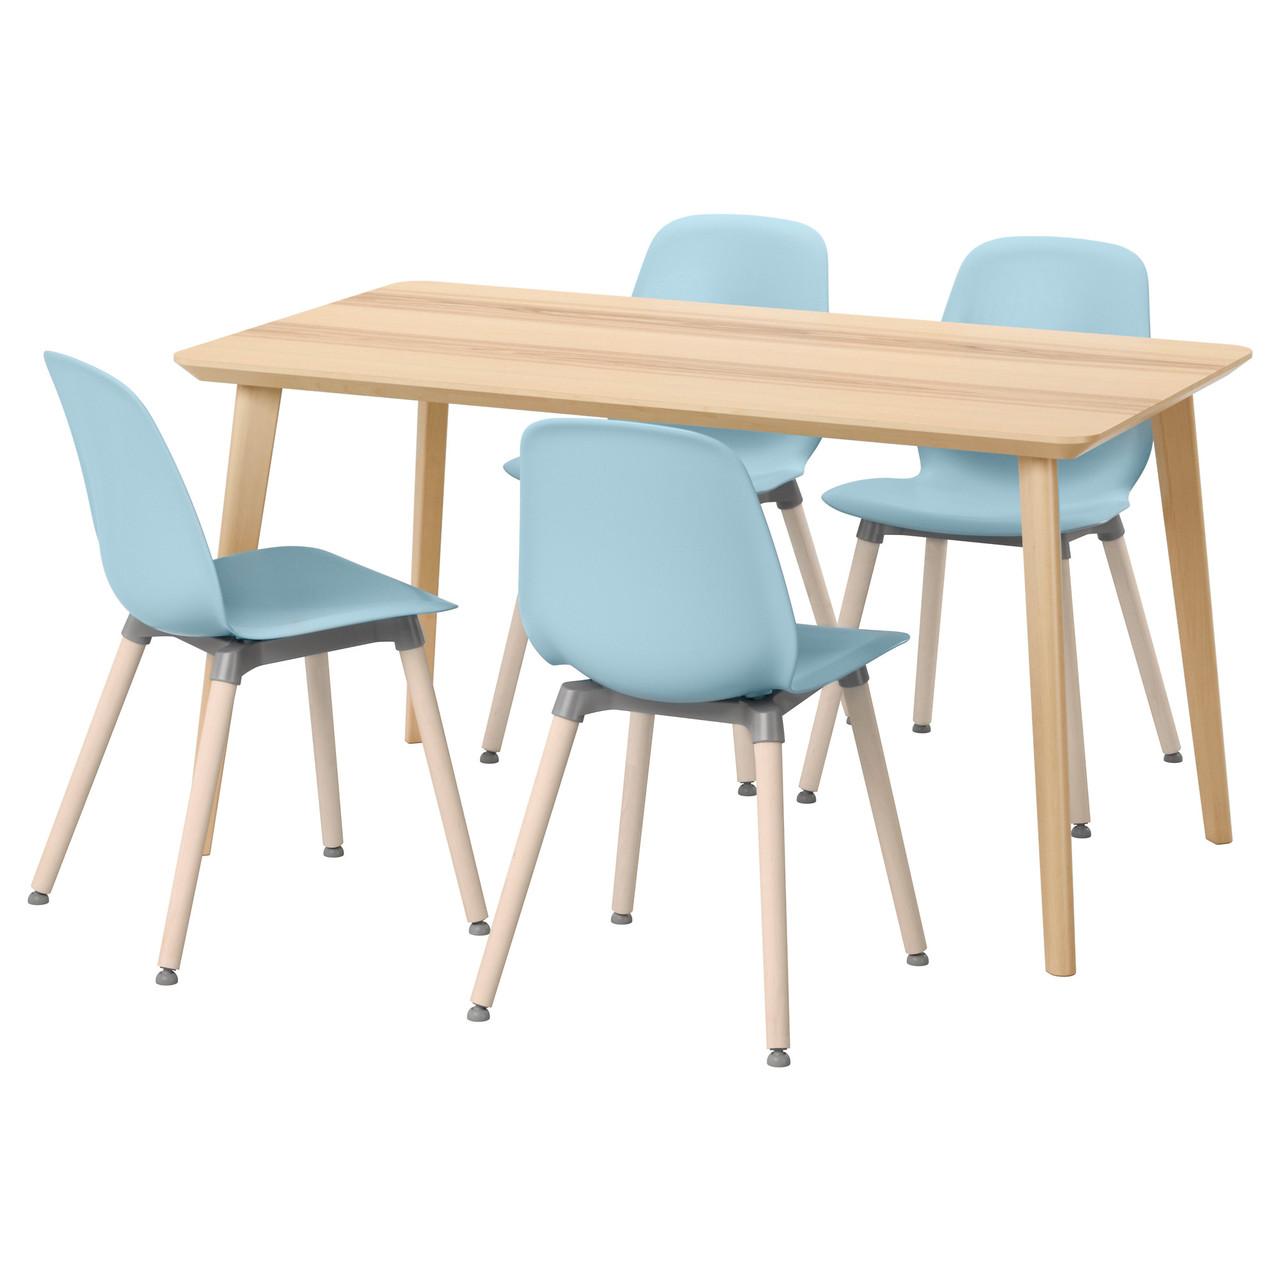 LISABO / LEIFARNE, стол и 4 стула